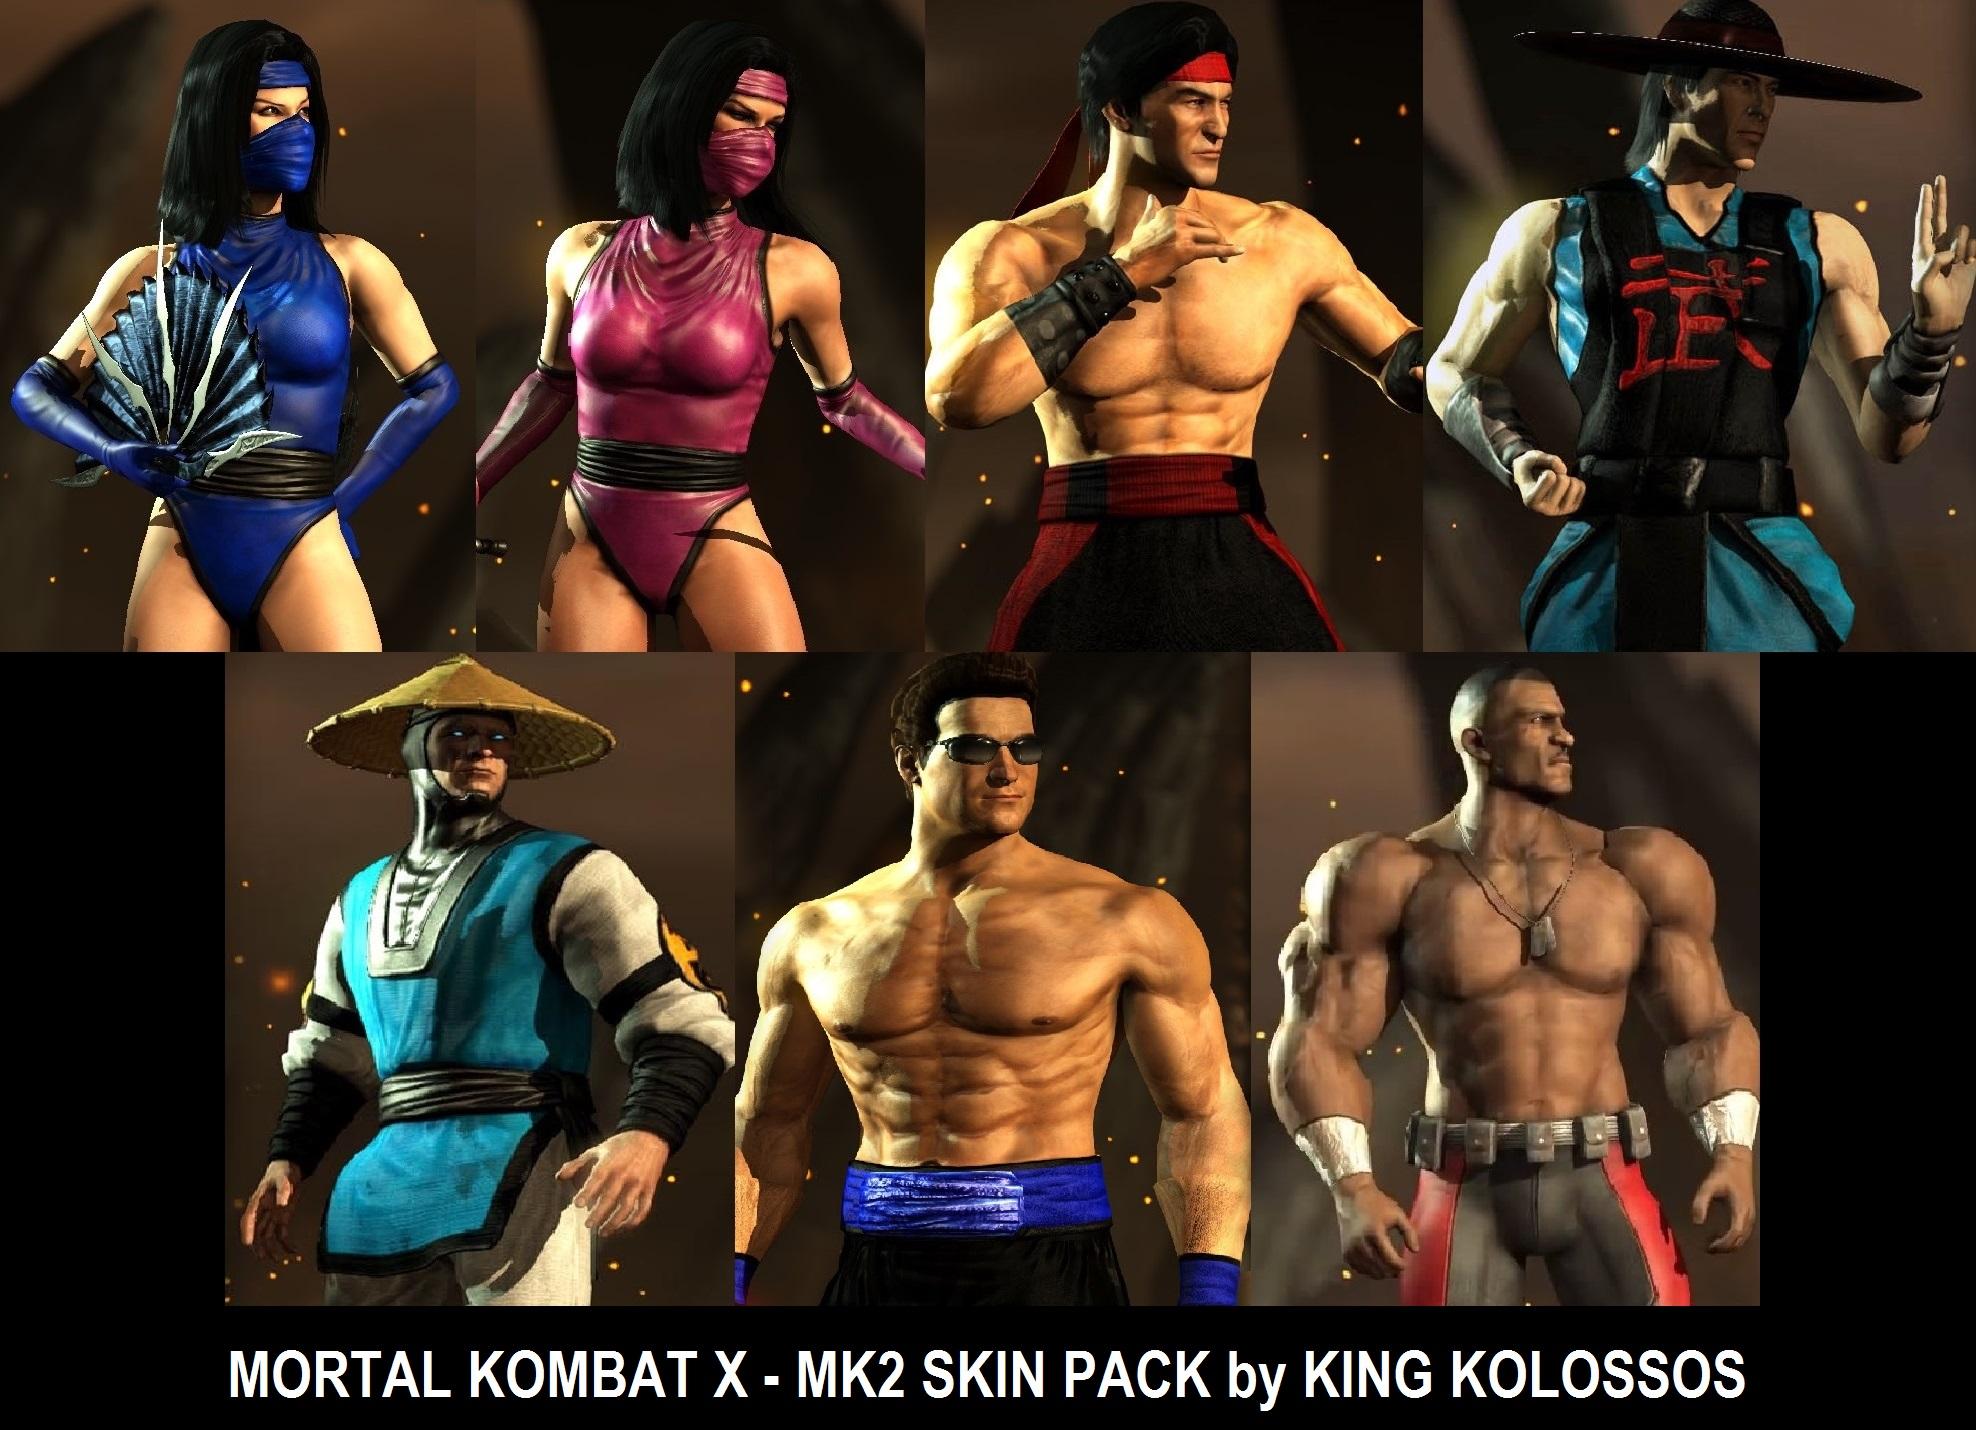 Mortal kombat mods sexy slut